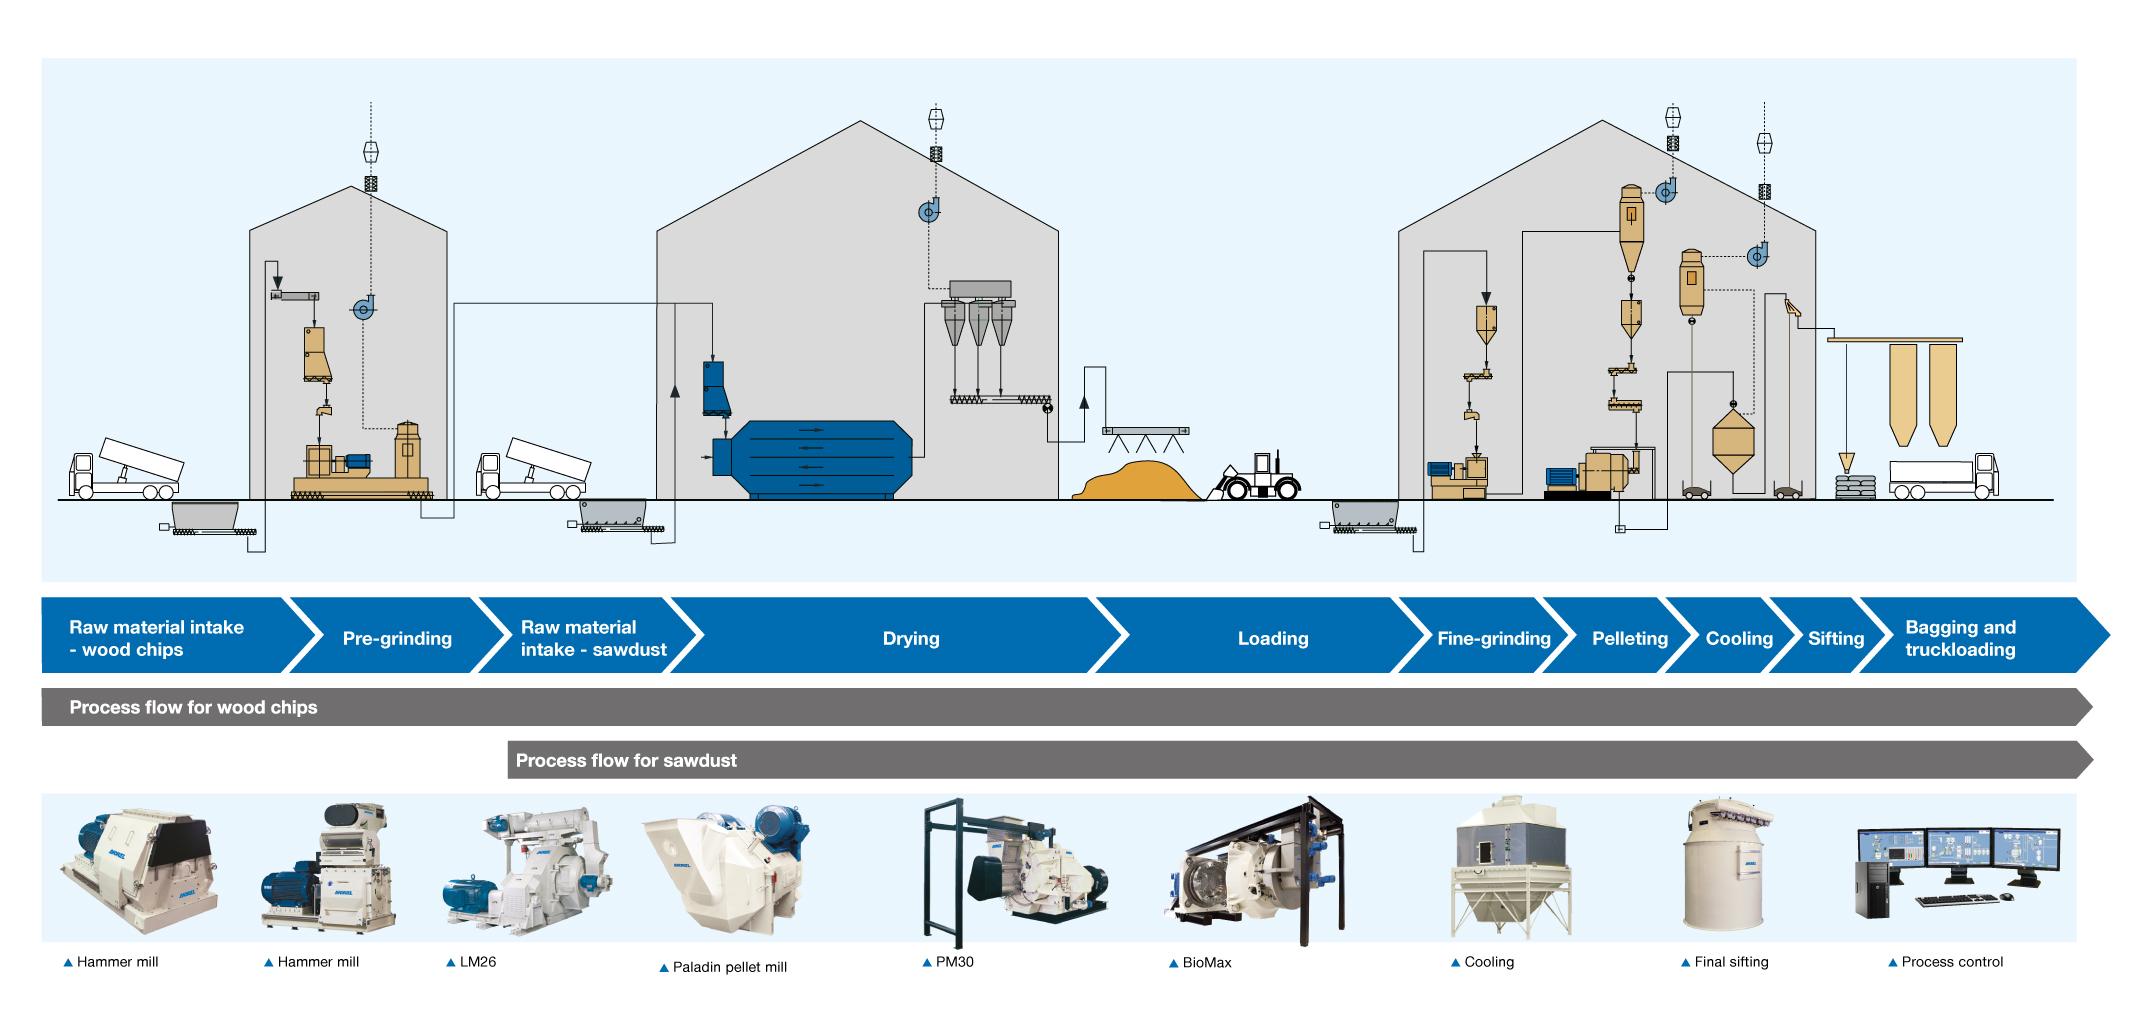 Biomass pelleting